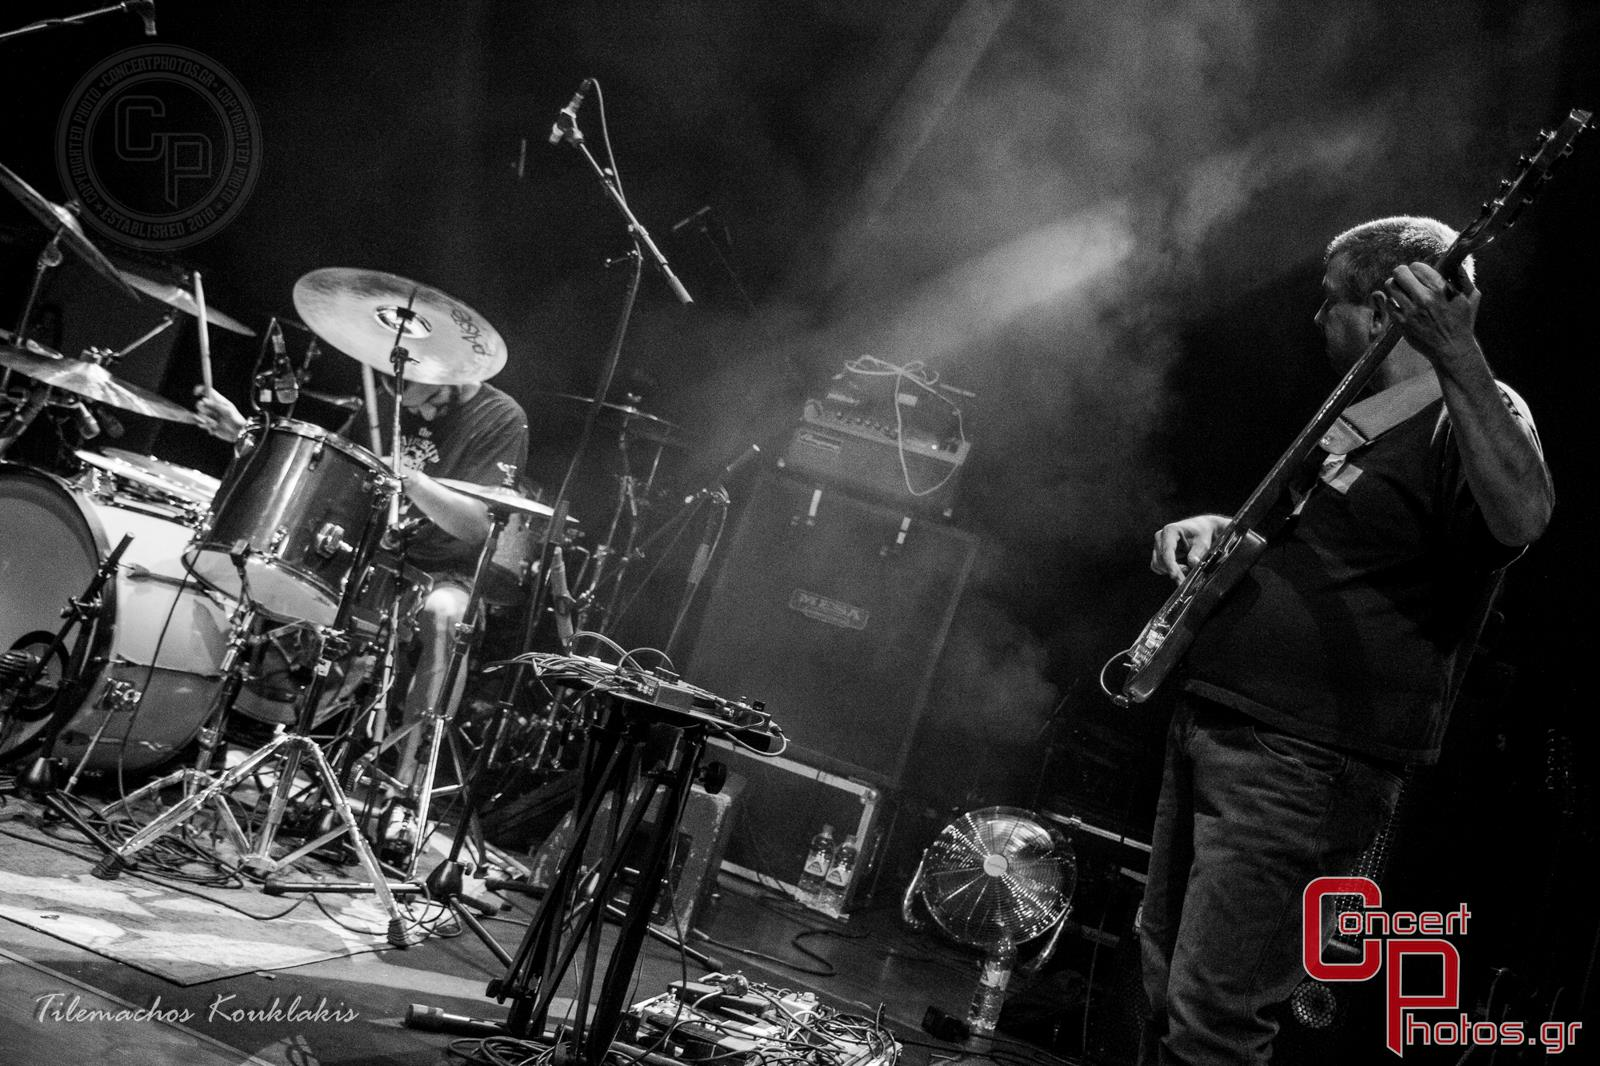 Neurosis-Neurosis photographer:  - concertphotos_20140707_23_56_48-4